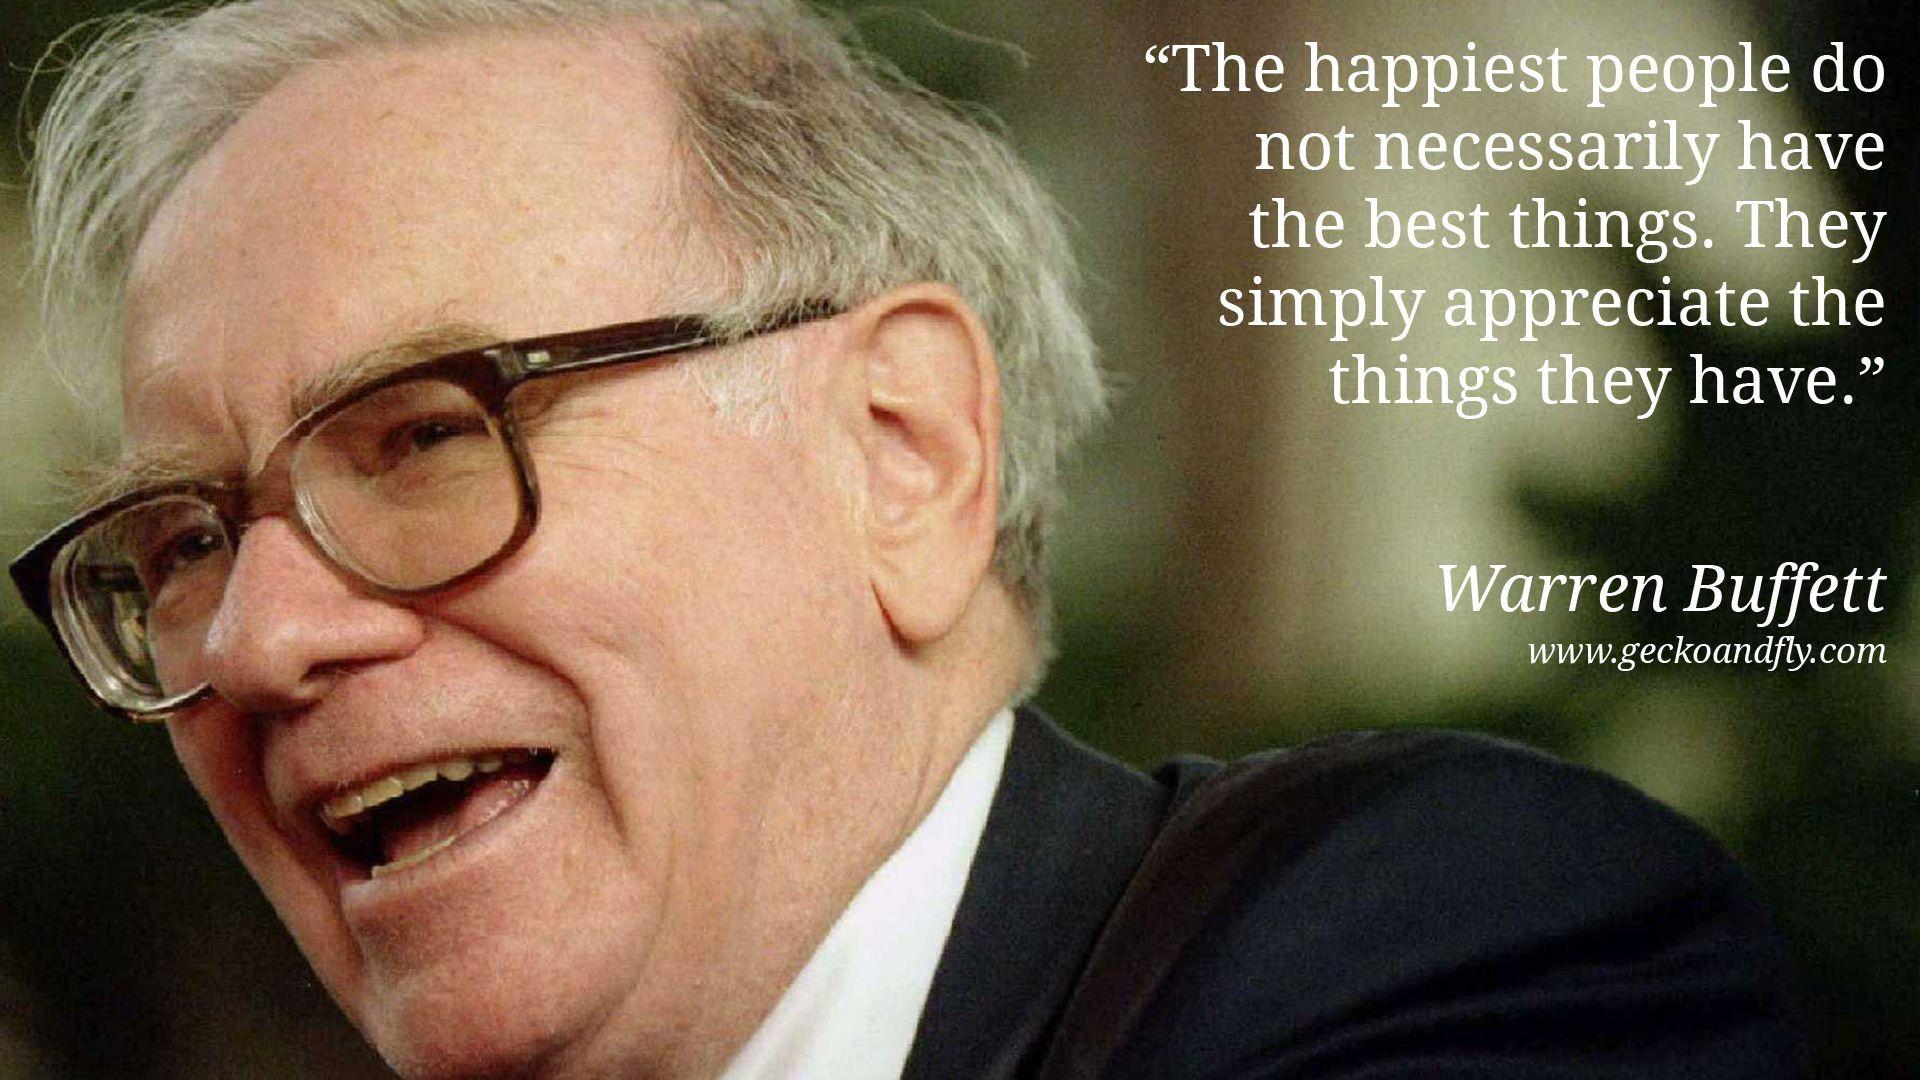 Warren Buffett Quotes 1920 Warren Buffett Quotes Wallpaper 1 Jpg Warrenbuffett Warrenbuffettquotes Warren Buffett Warren Buffet Quotes Investment Quotes